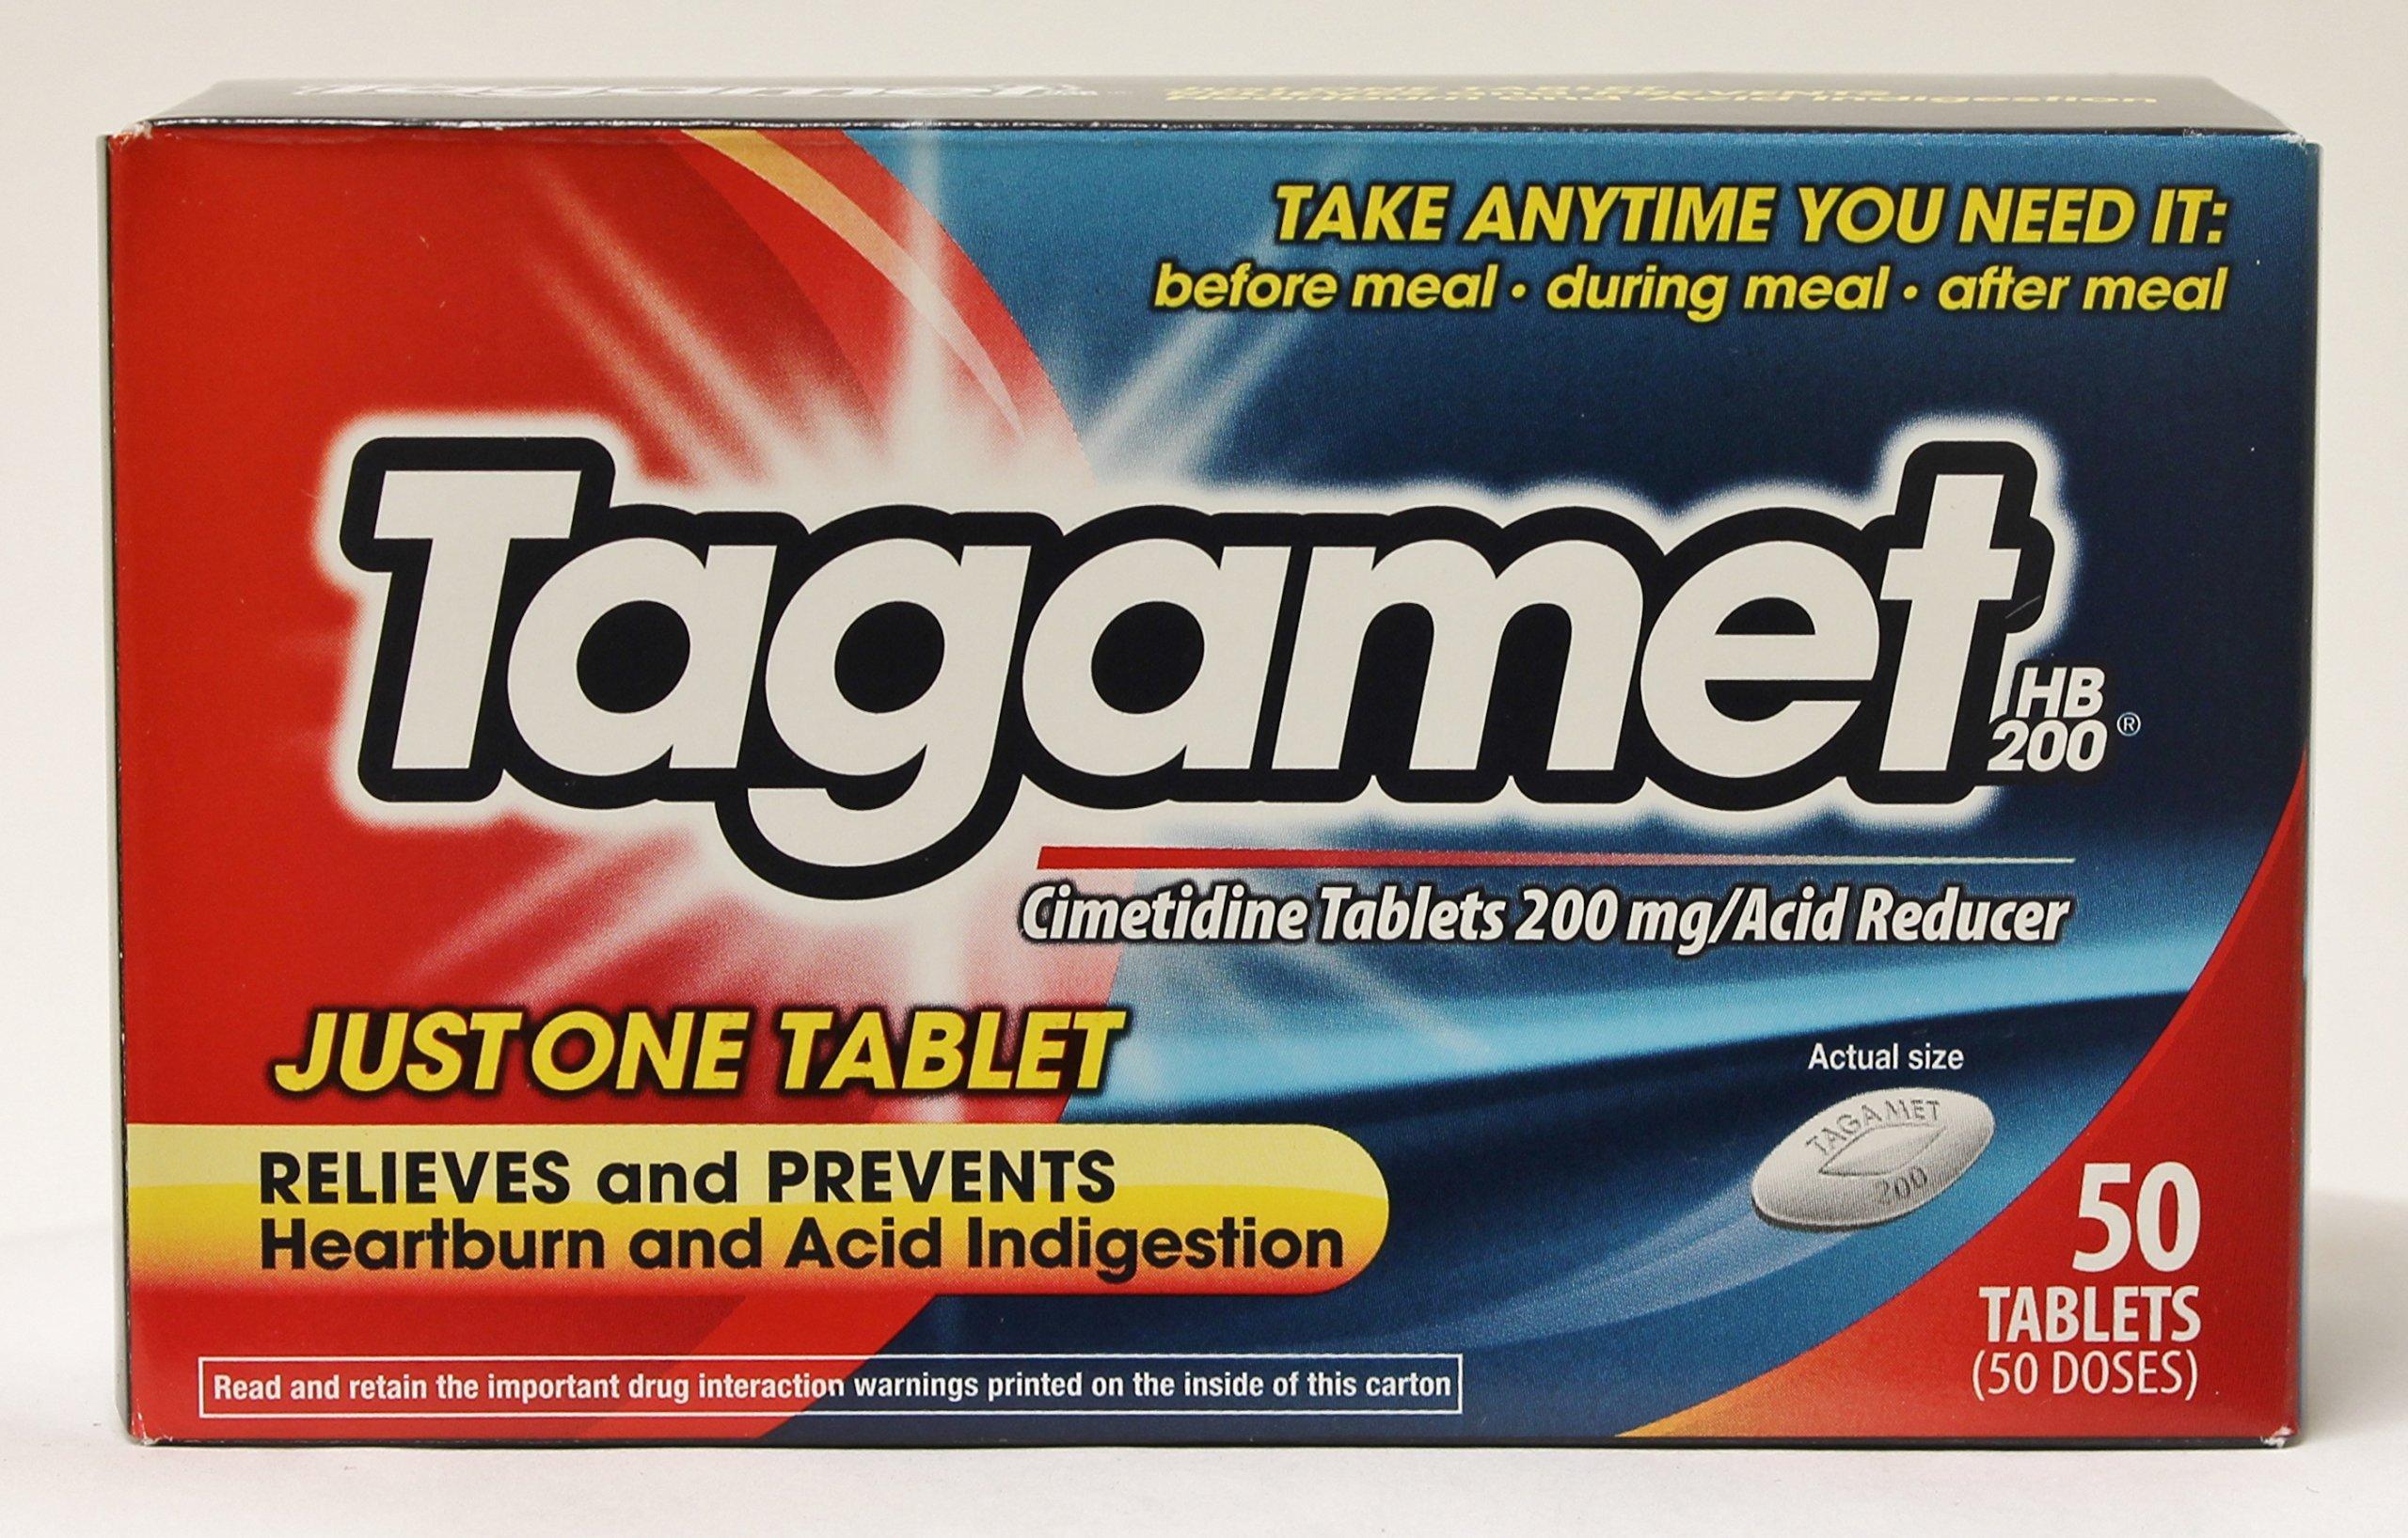 Tagamet Acid Reducer 200 mg 50 Tablets